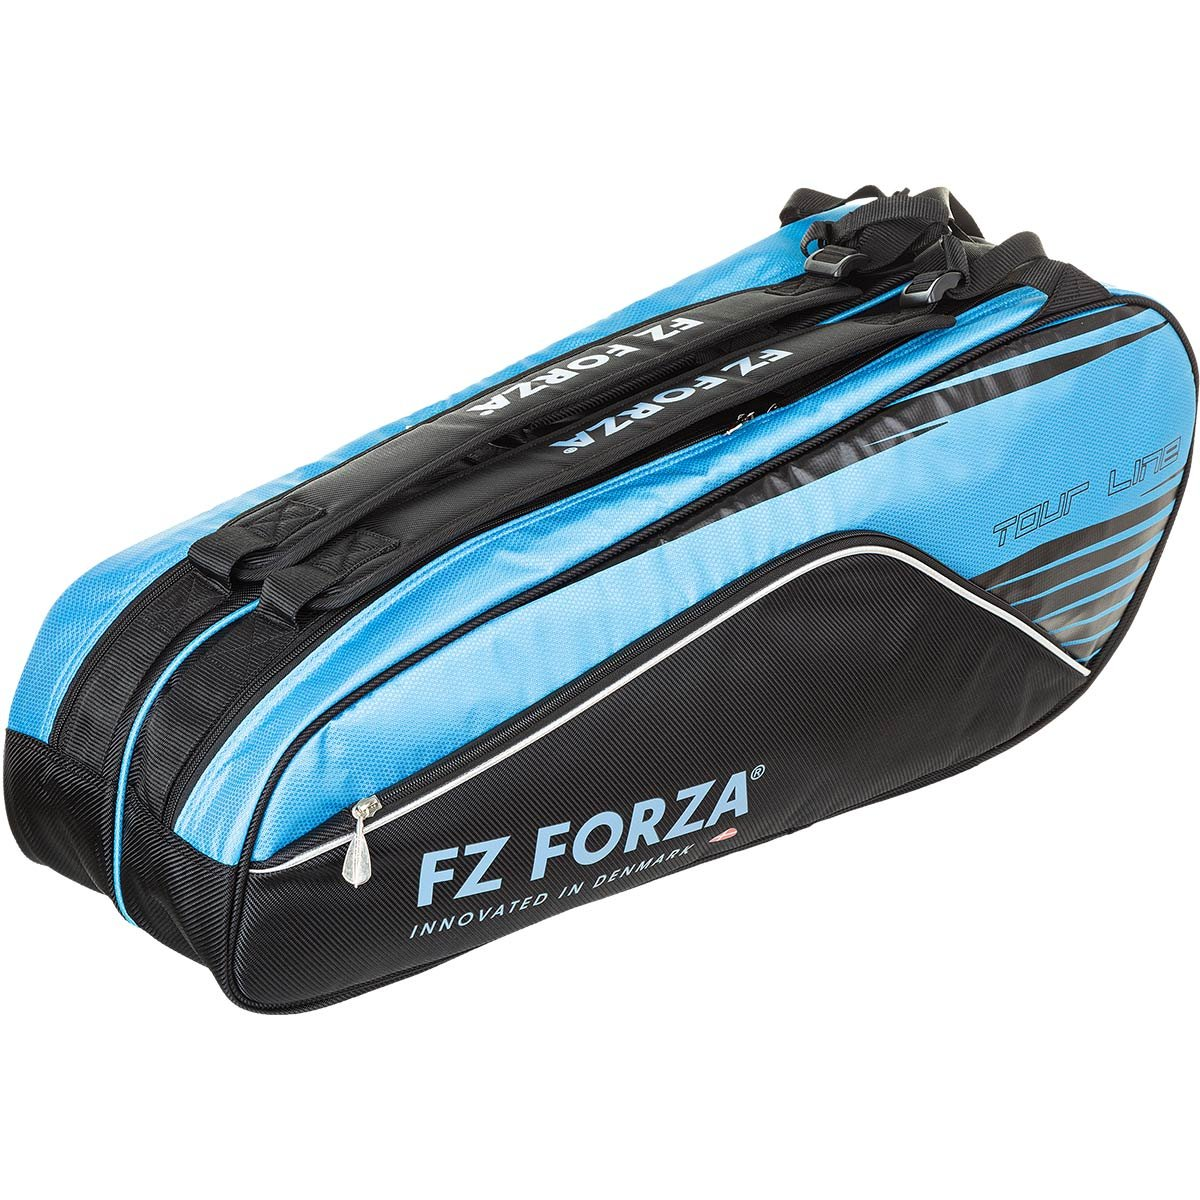 Køb FZ FORZA Tour Line Badmintontaske – Alaskan Blue